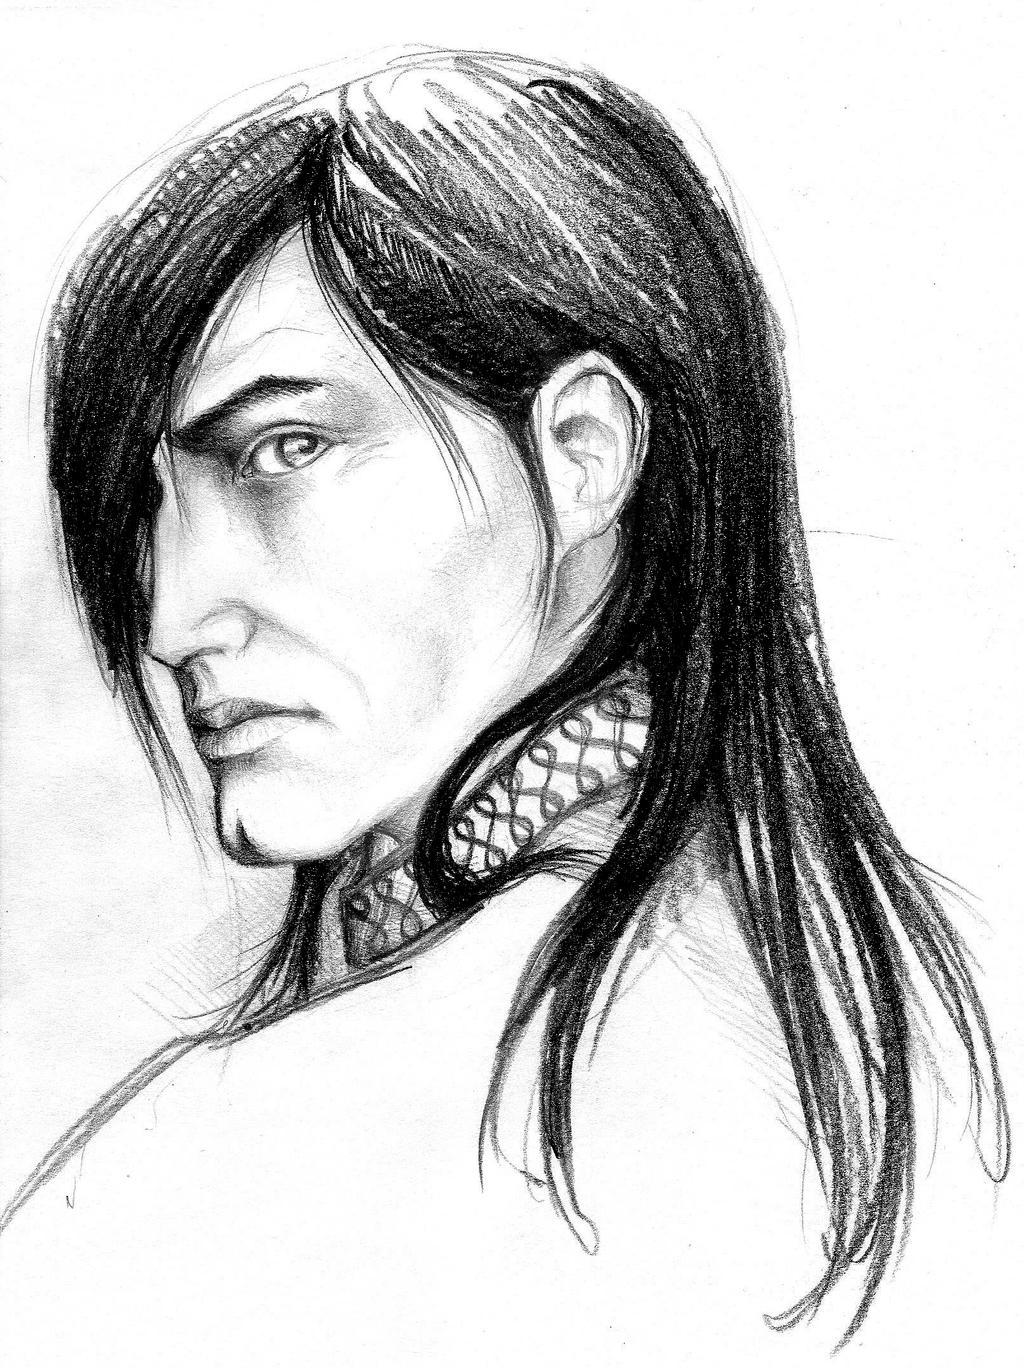 http://fc09.deviantart.net/fs71/i/2012/025/7/b/ser_avery_by_yuhime-d4nk43j.jpg